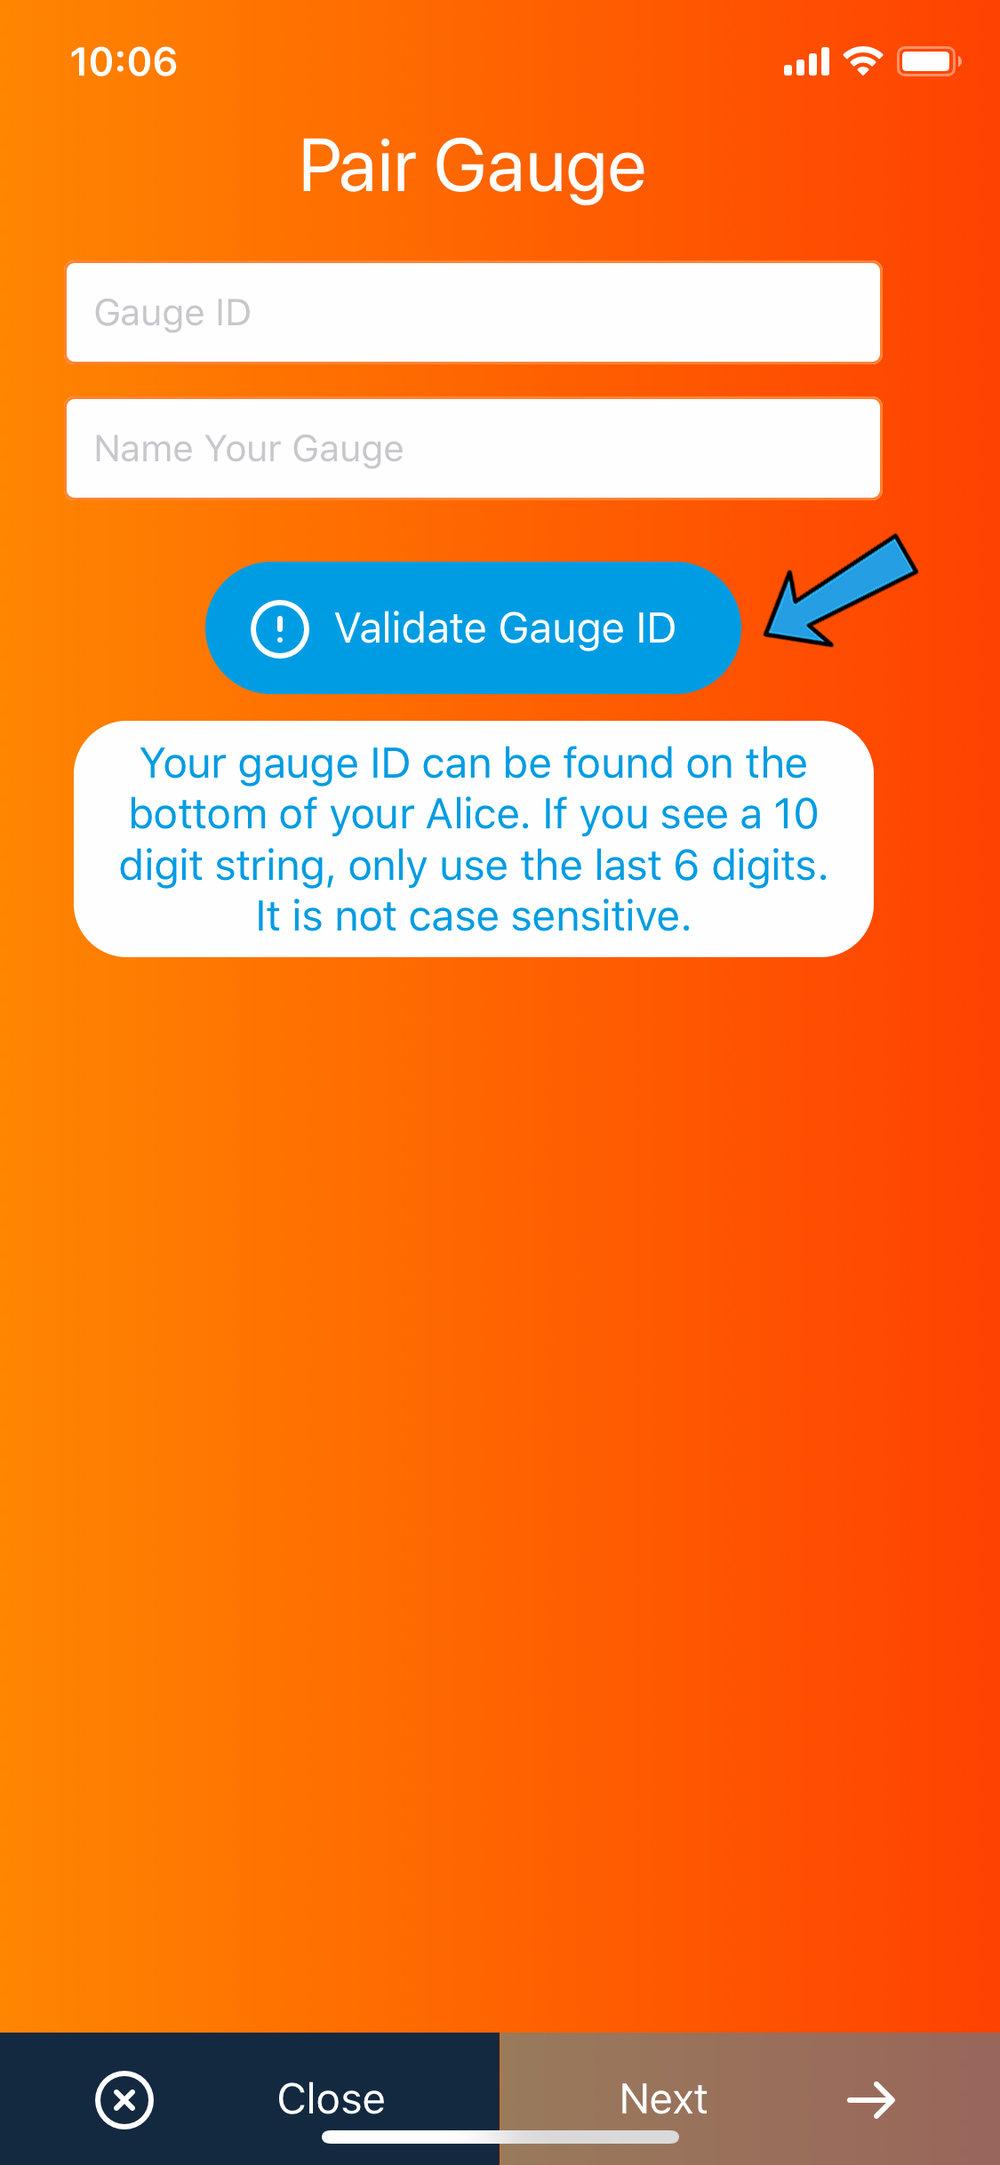 Pair gauge - validate button.jpg